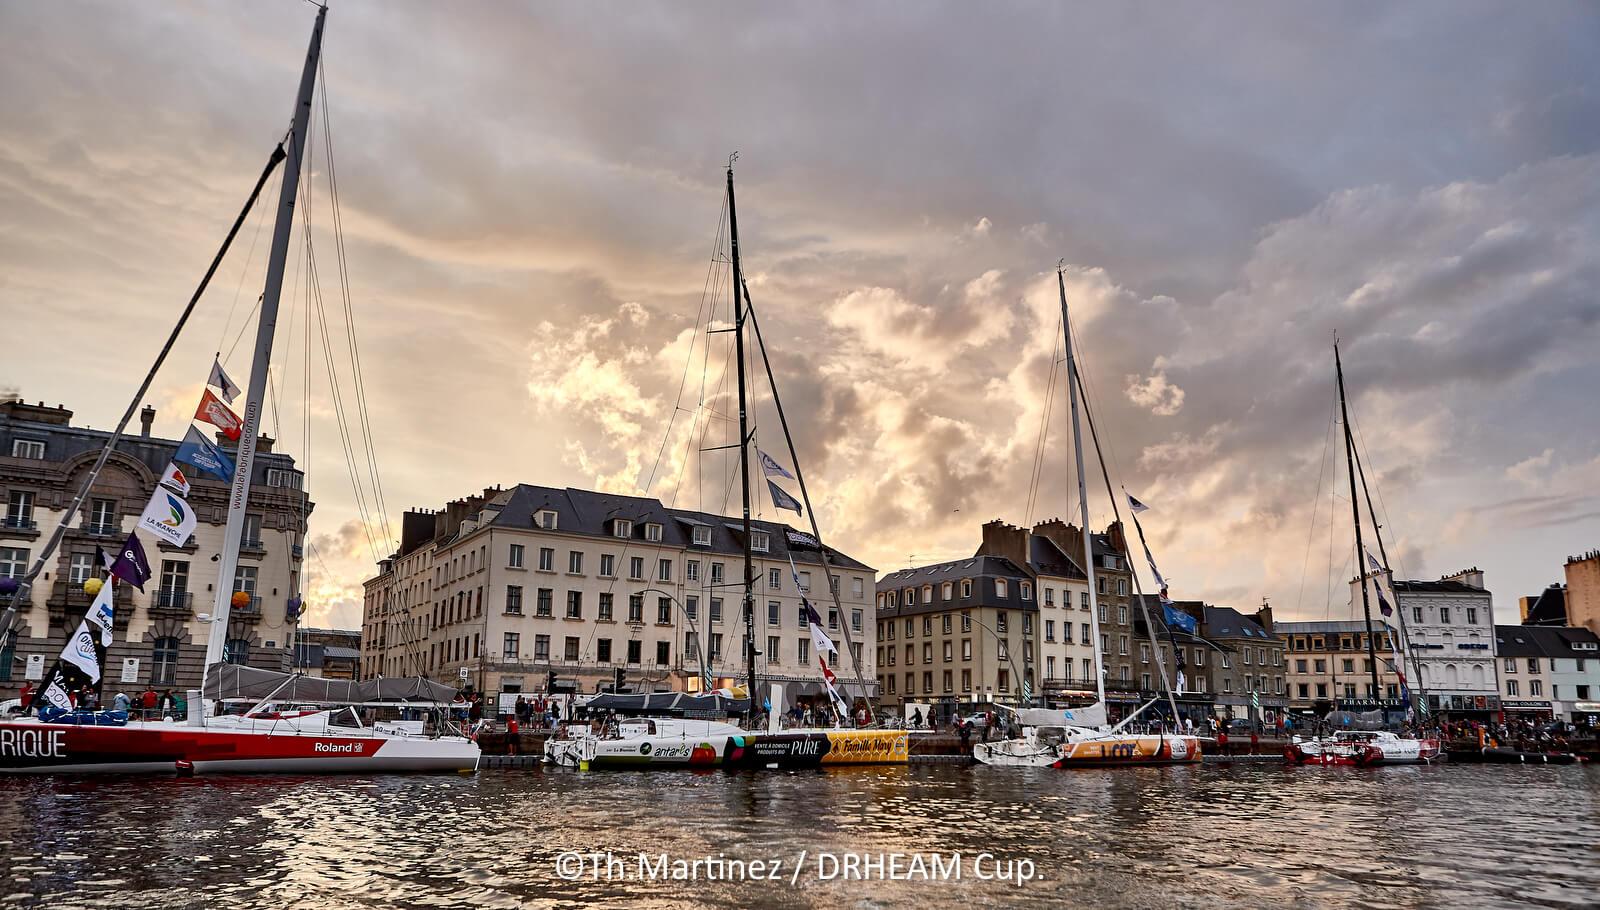 18_113994 © Thierry Martinez. CHERBOURG - FRANCE . 27 Juillet 2018. DRHEAM CUP, Destination Cotentin 2018.